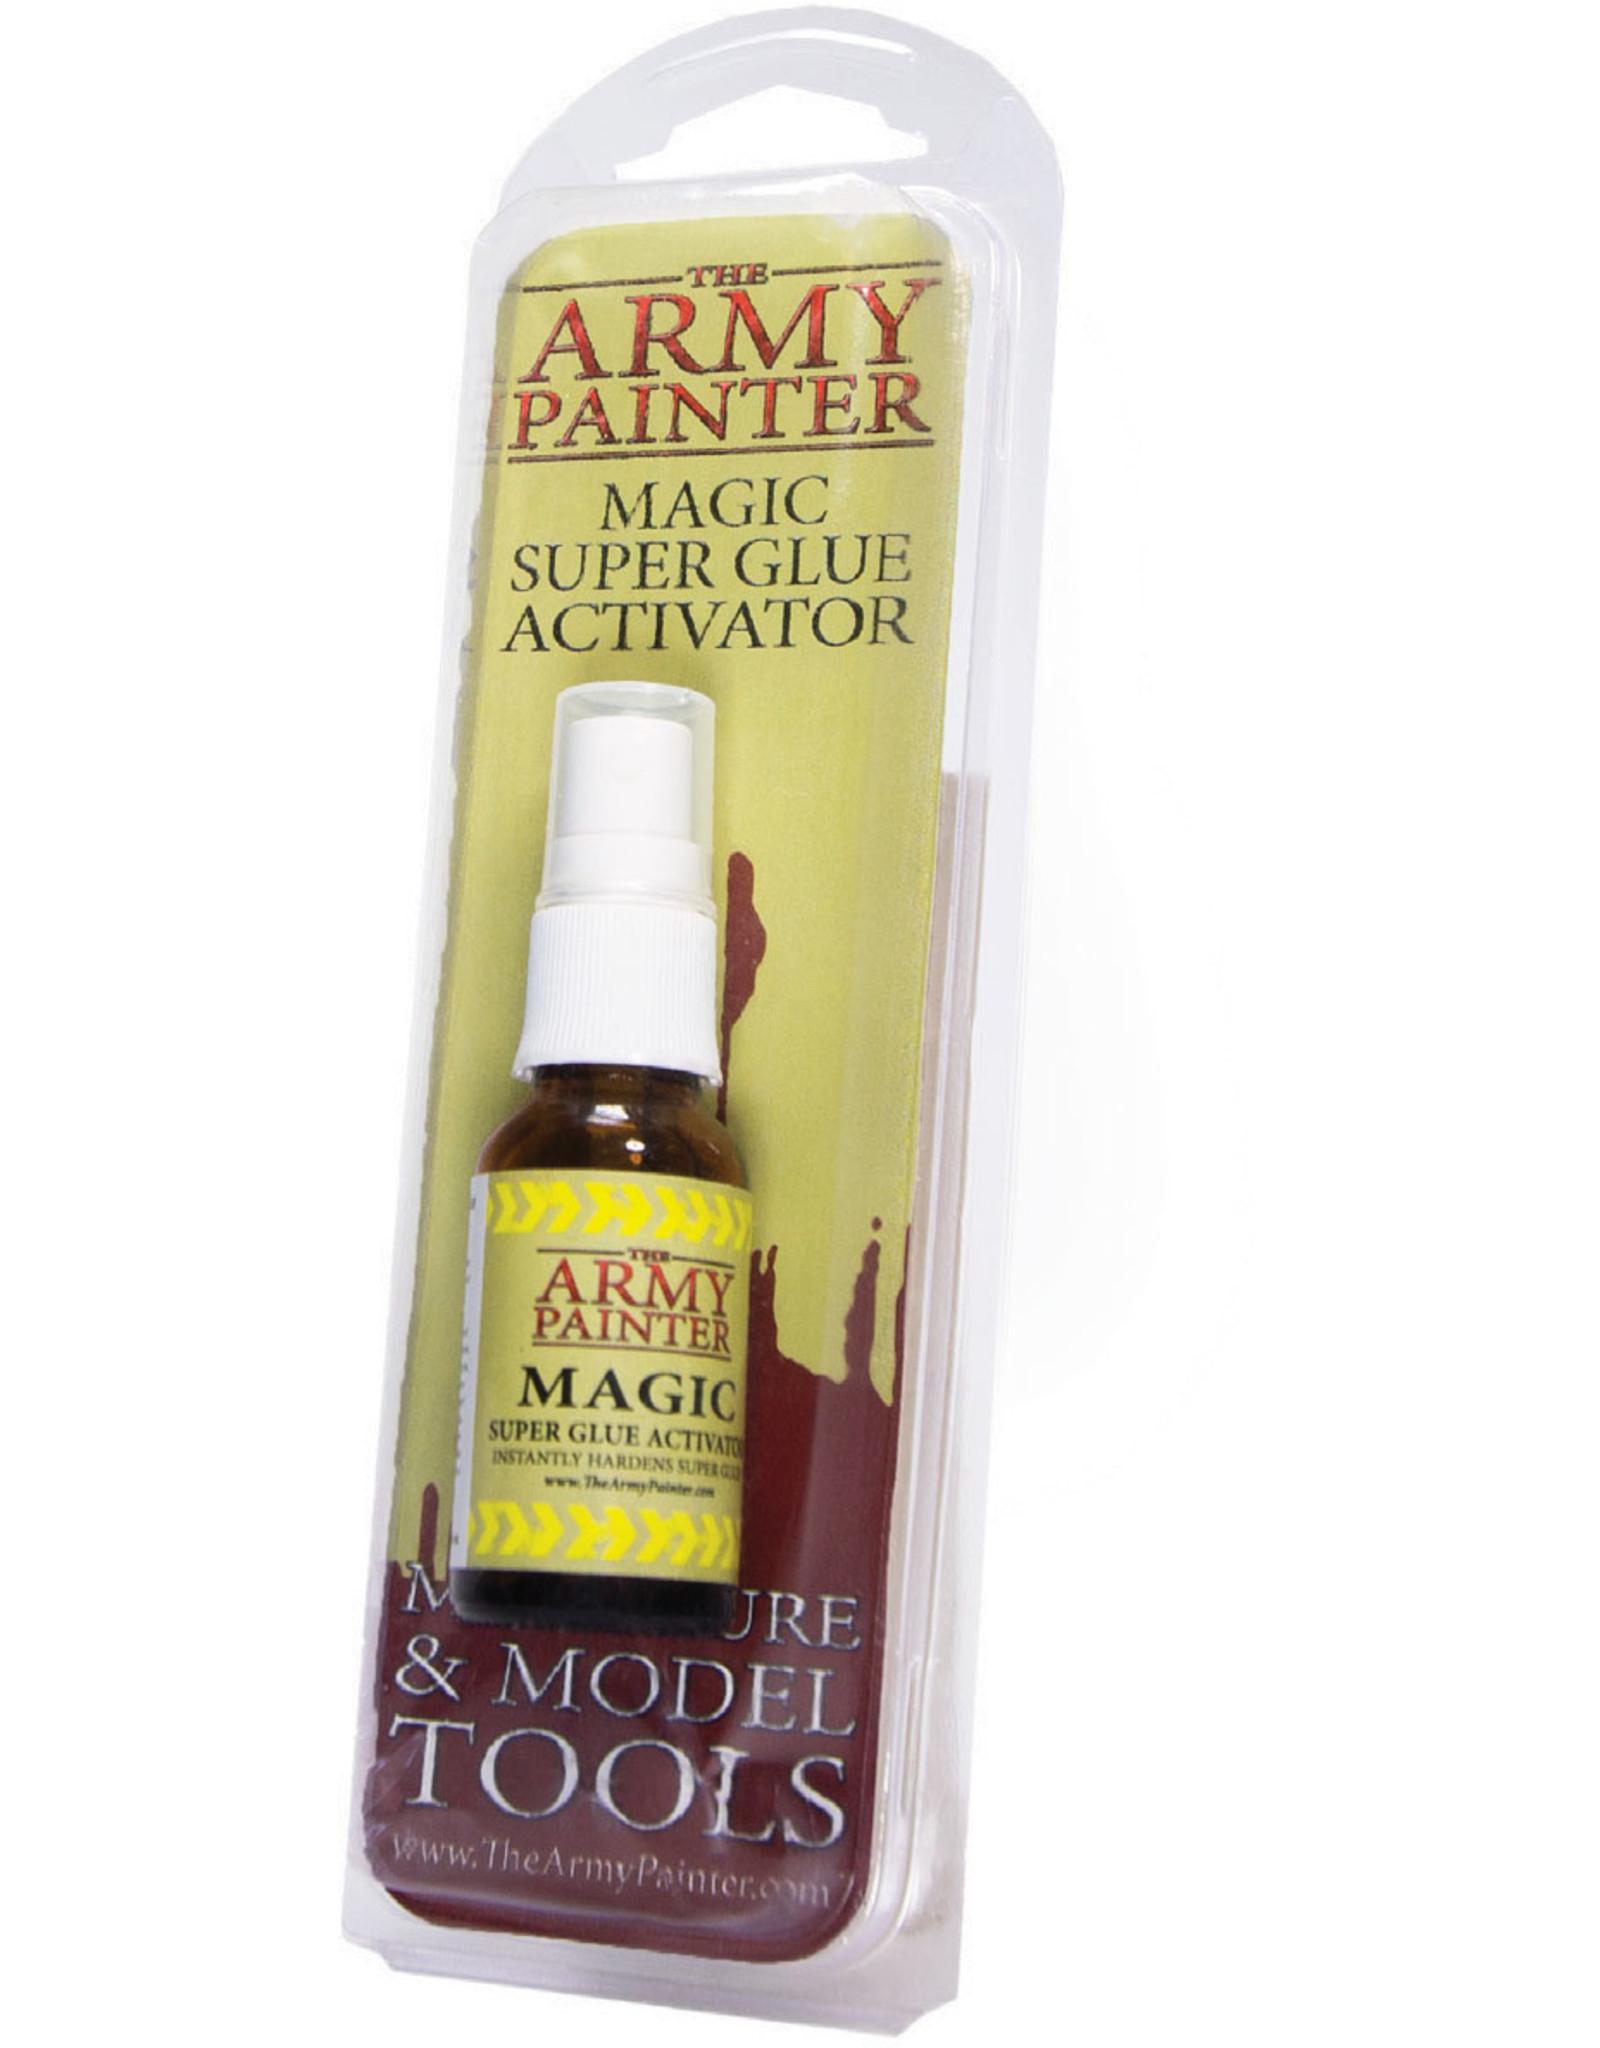 Army Painter Super Glue Activator